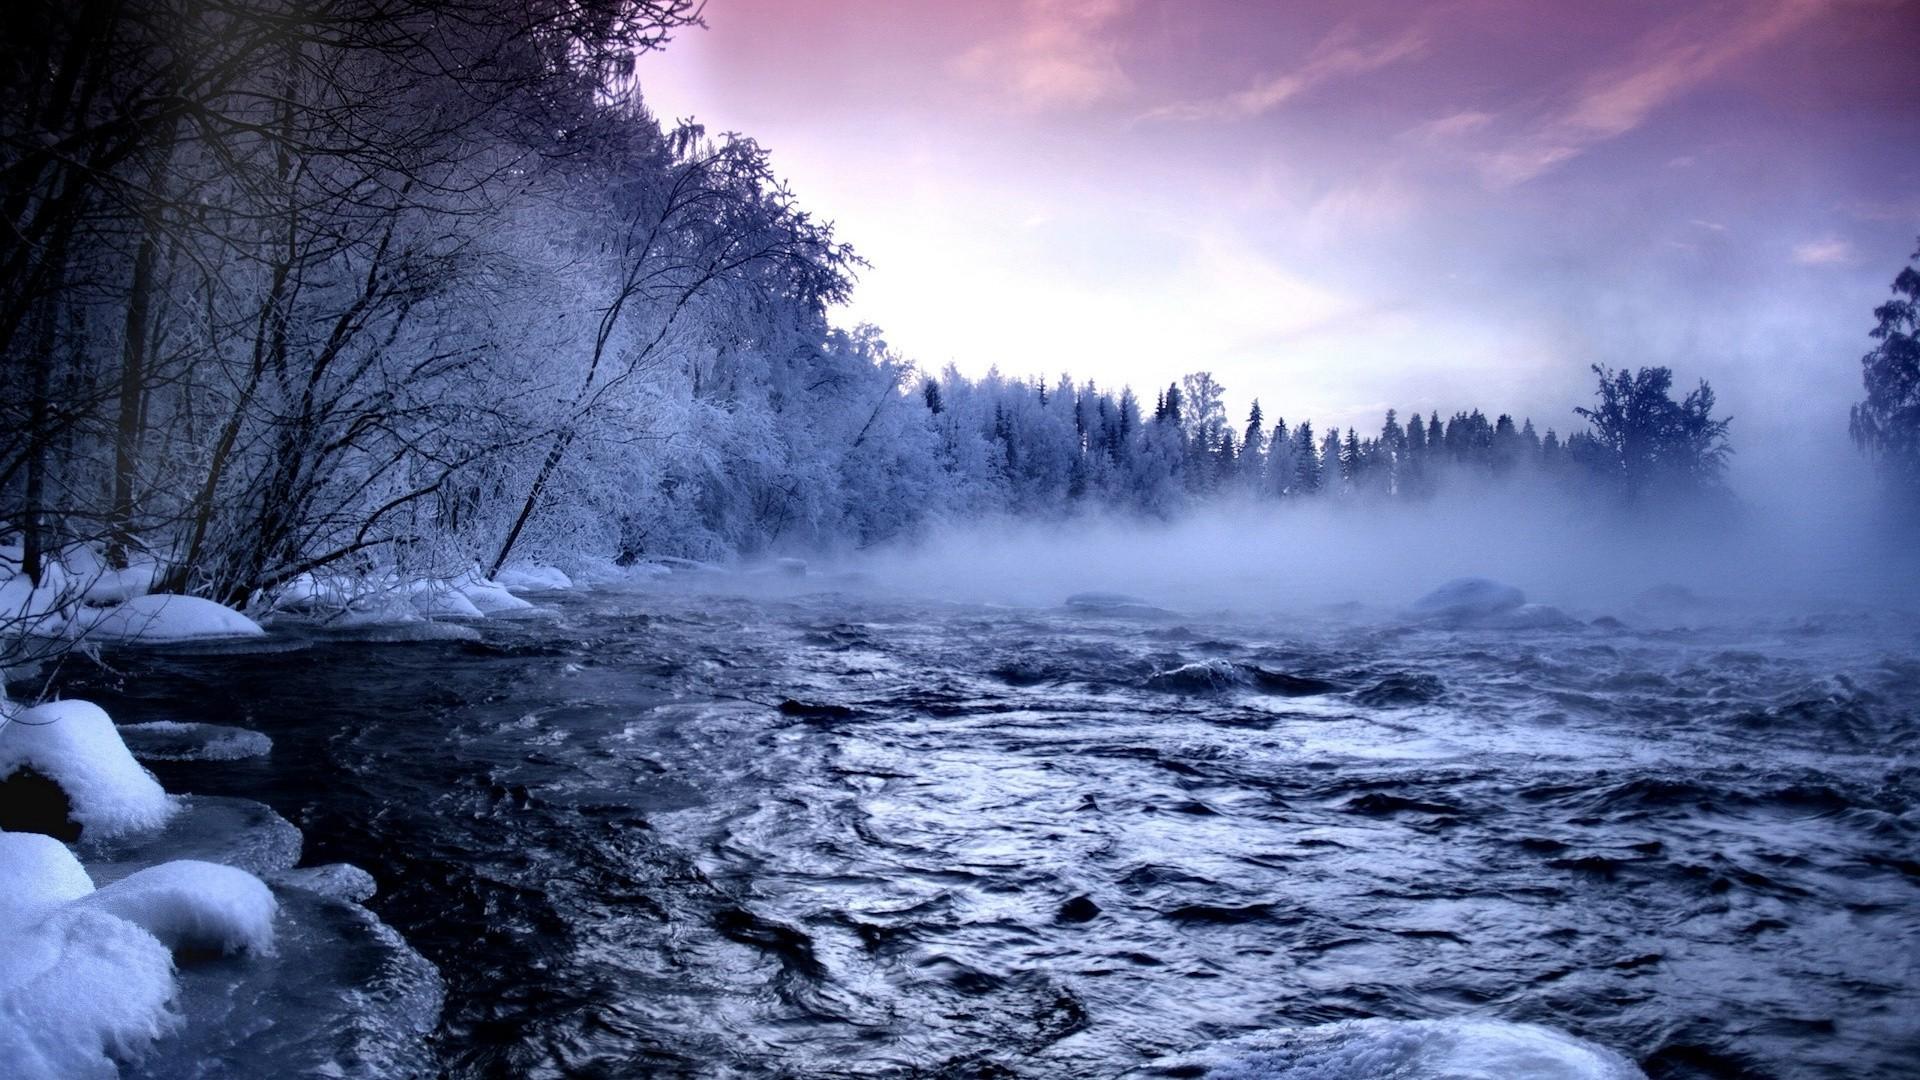 Fall Scene Wallpaper For Iphone Forest Photos Frozen Hd Desktop Wallpapers 4k Hd